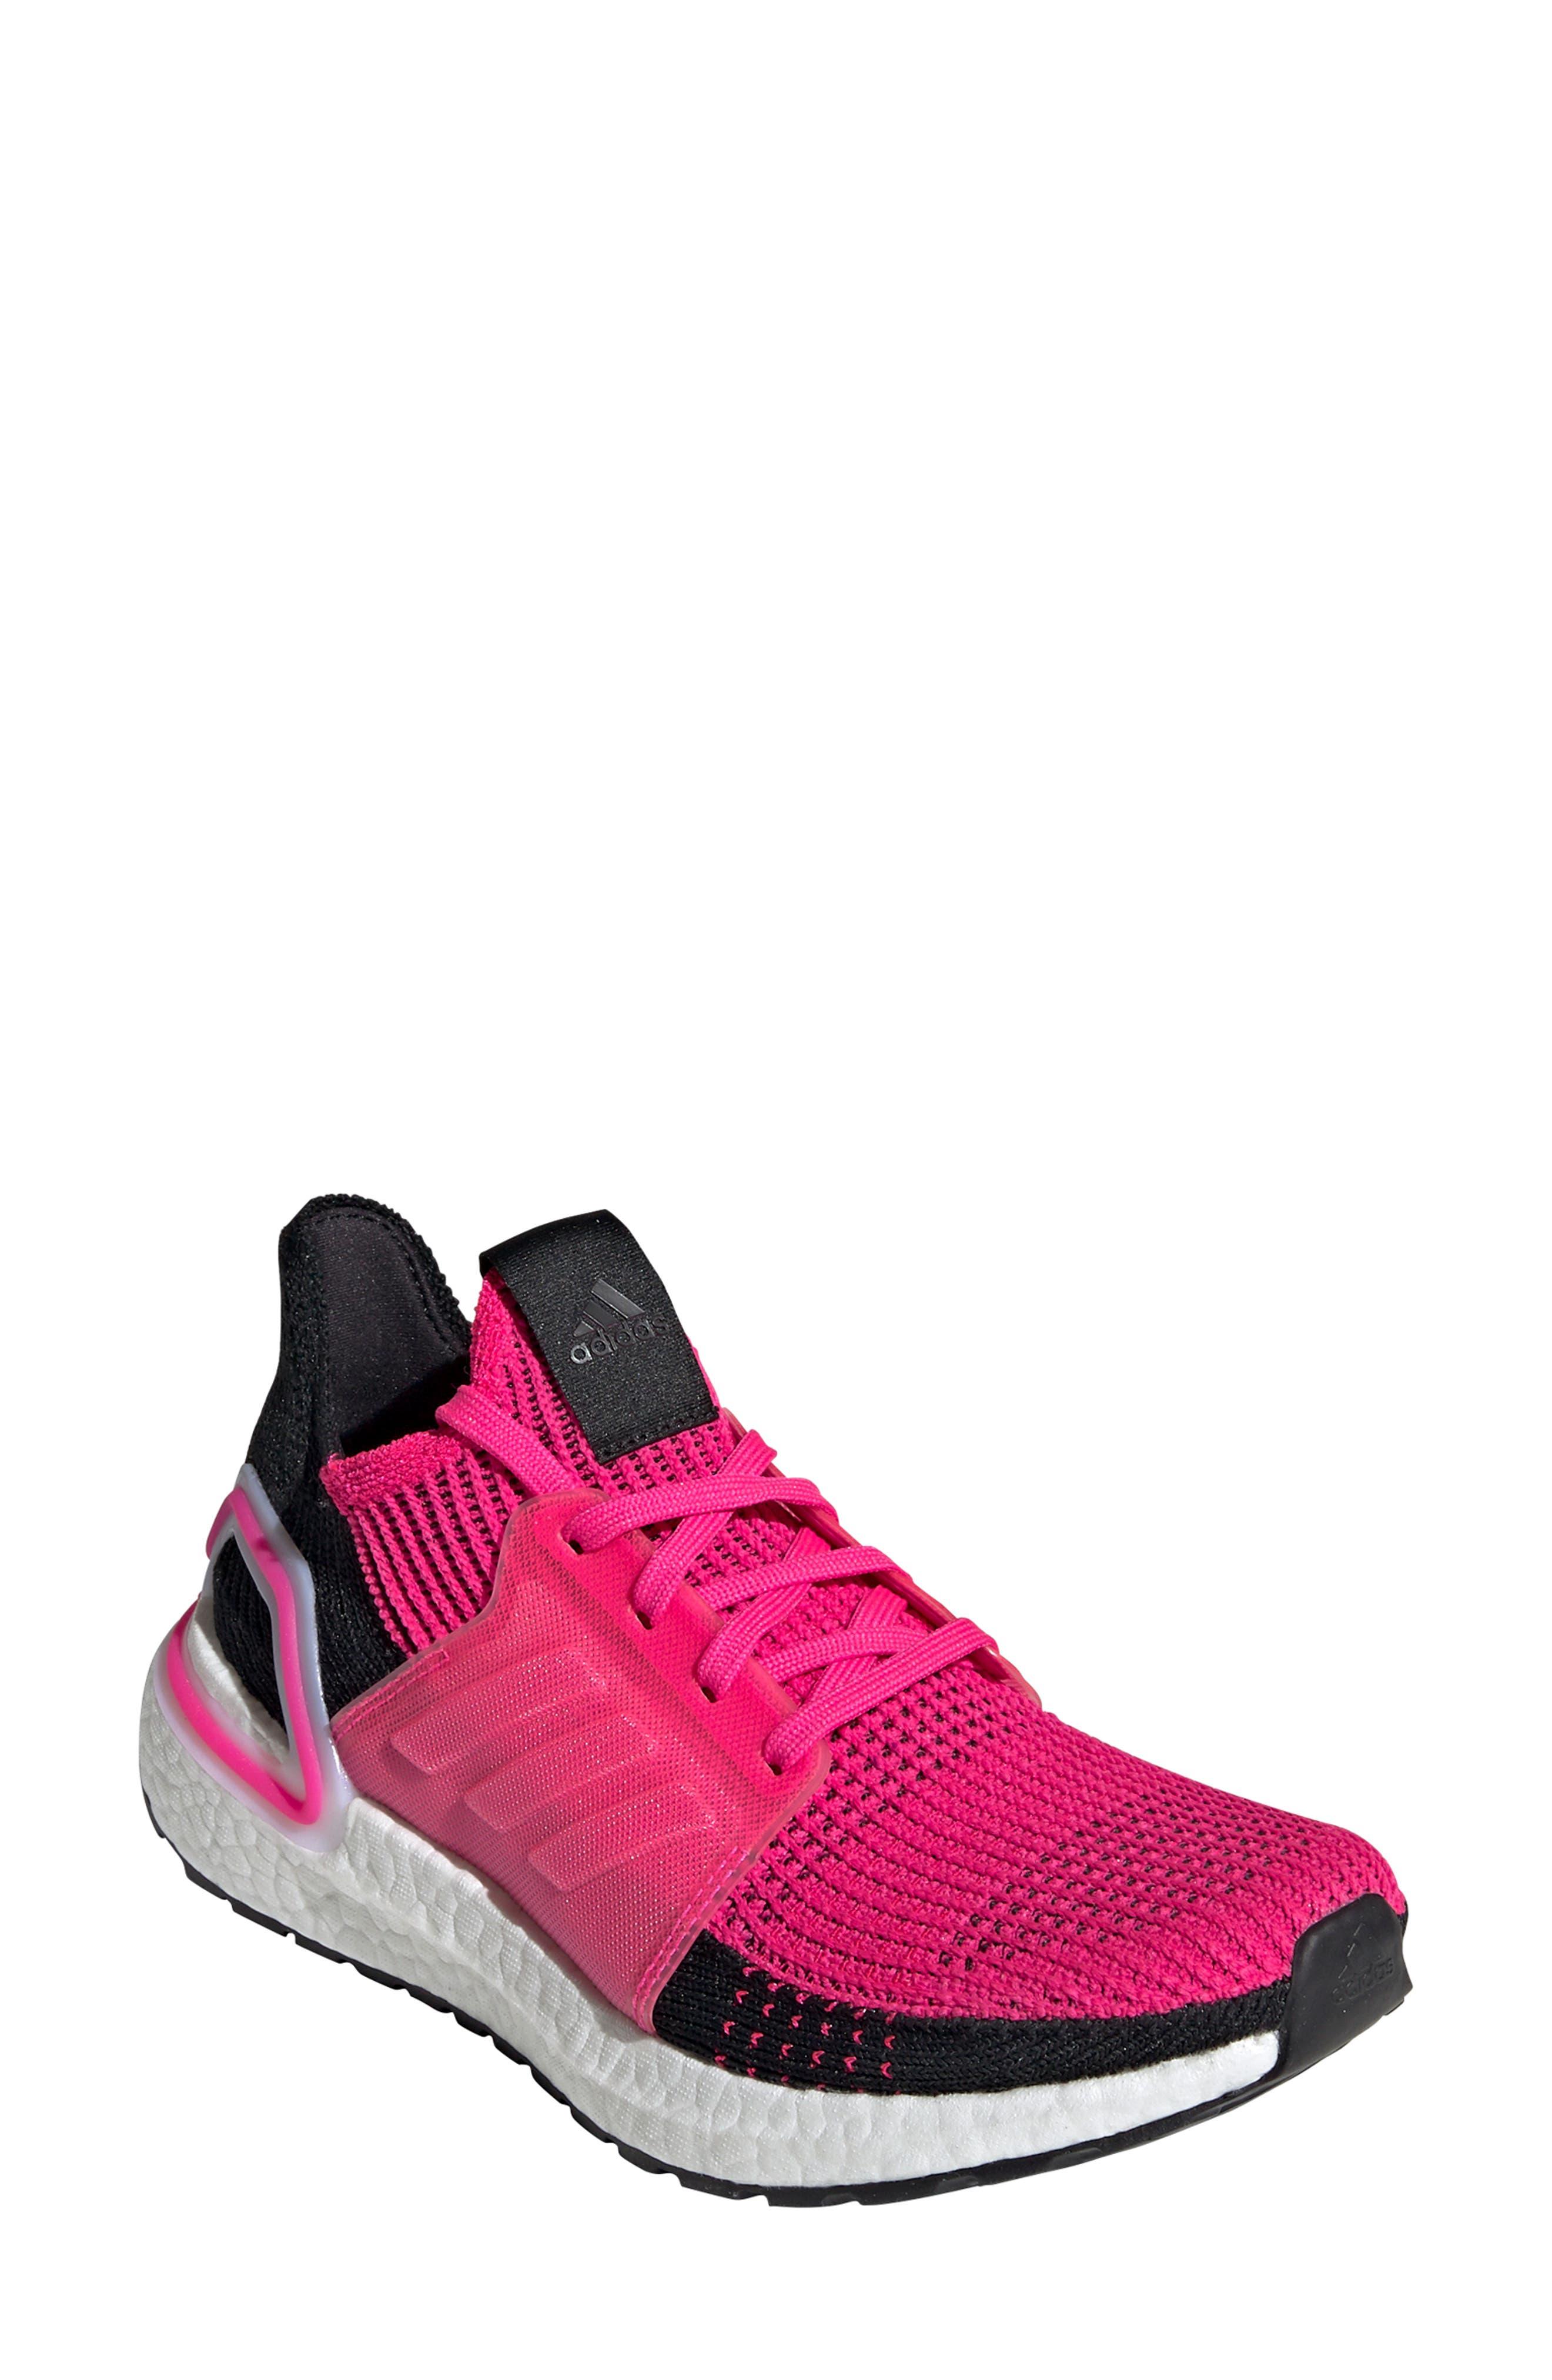 adidas | UltraBoost 19 Running Shoe